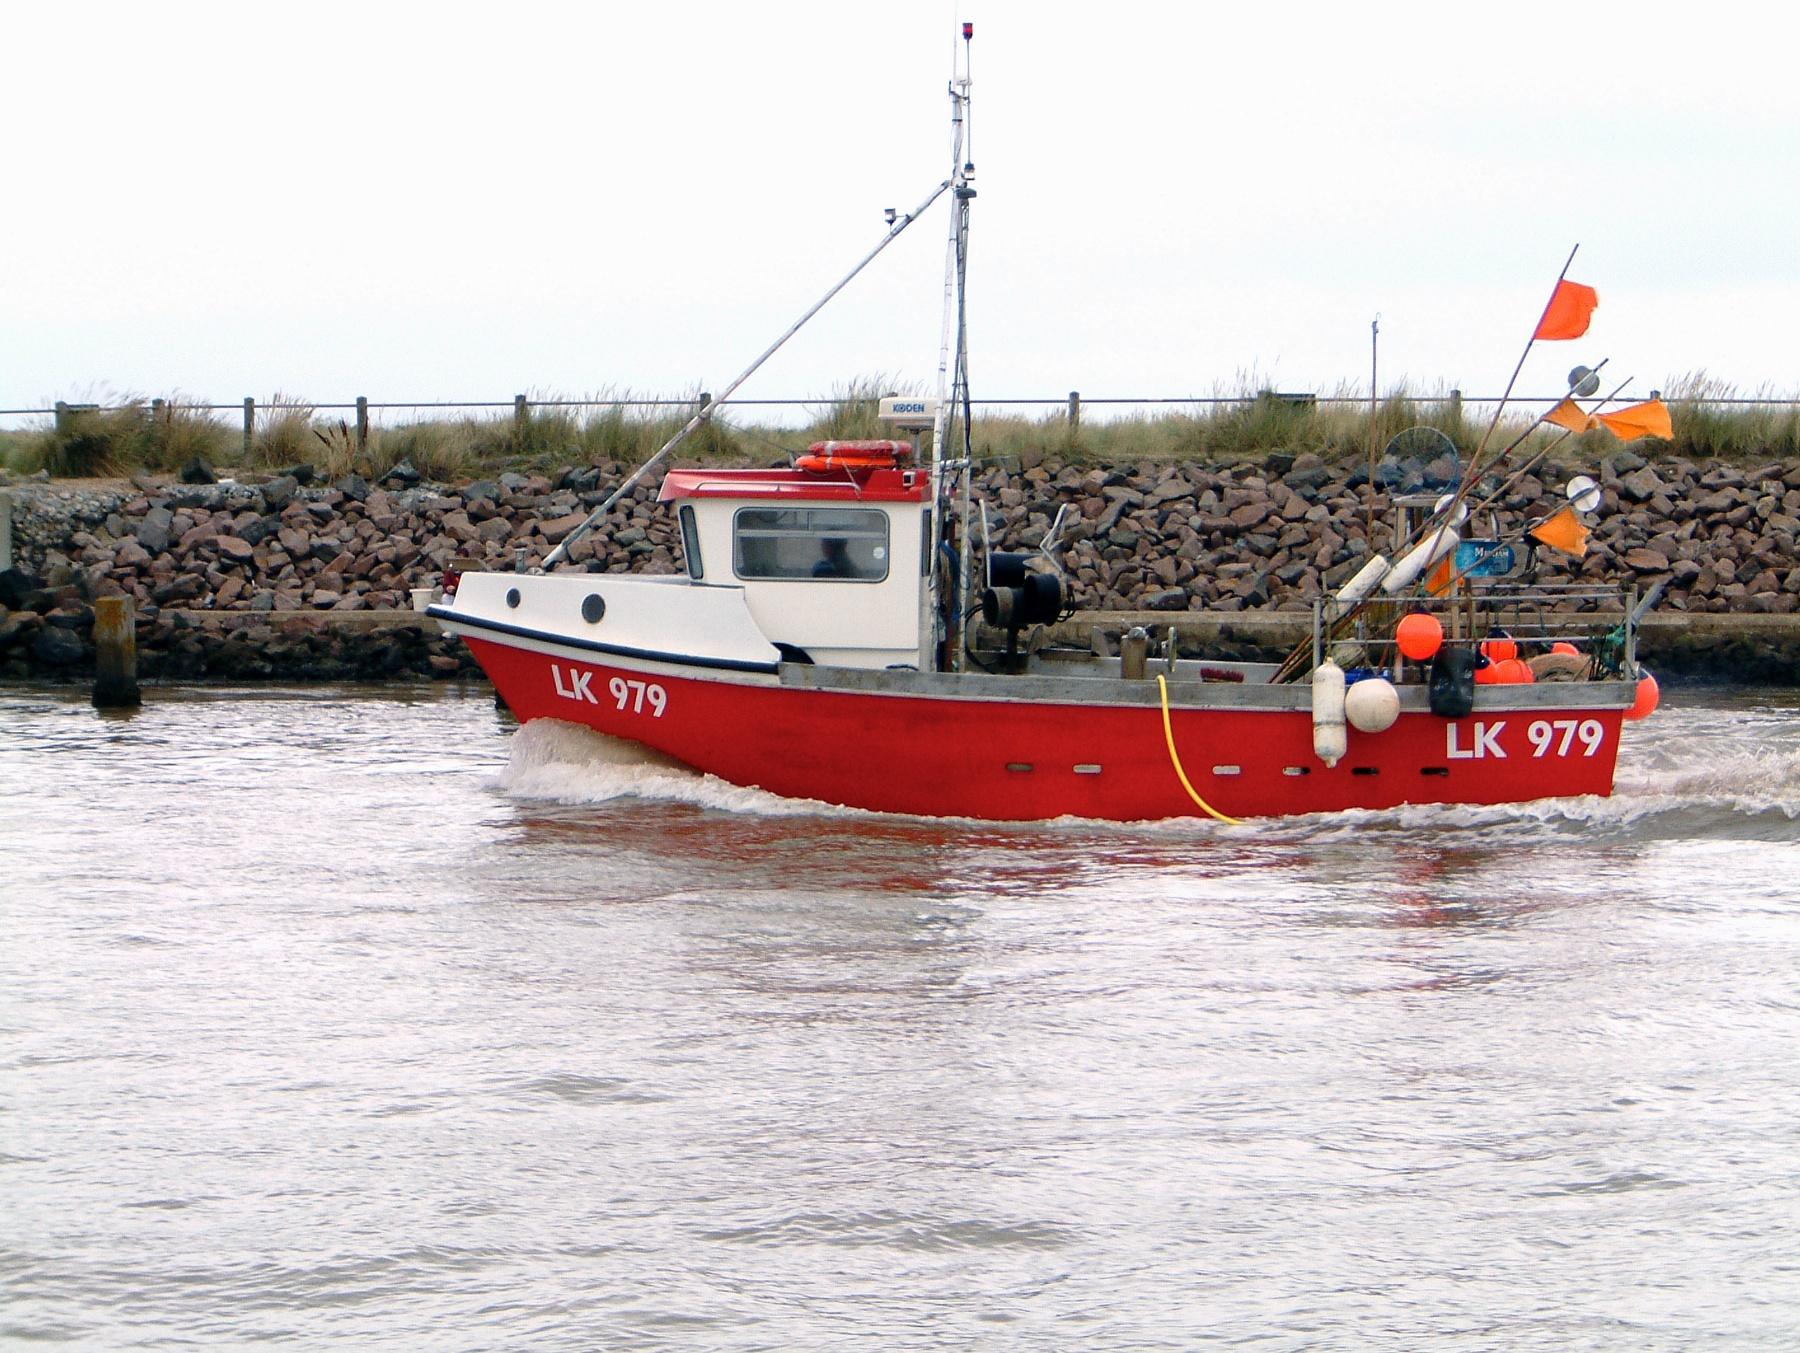 Walberswick Crabbing 21-8-2005 Fishing Boat